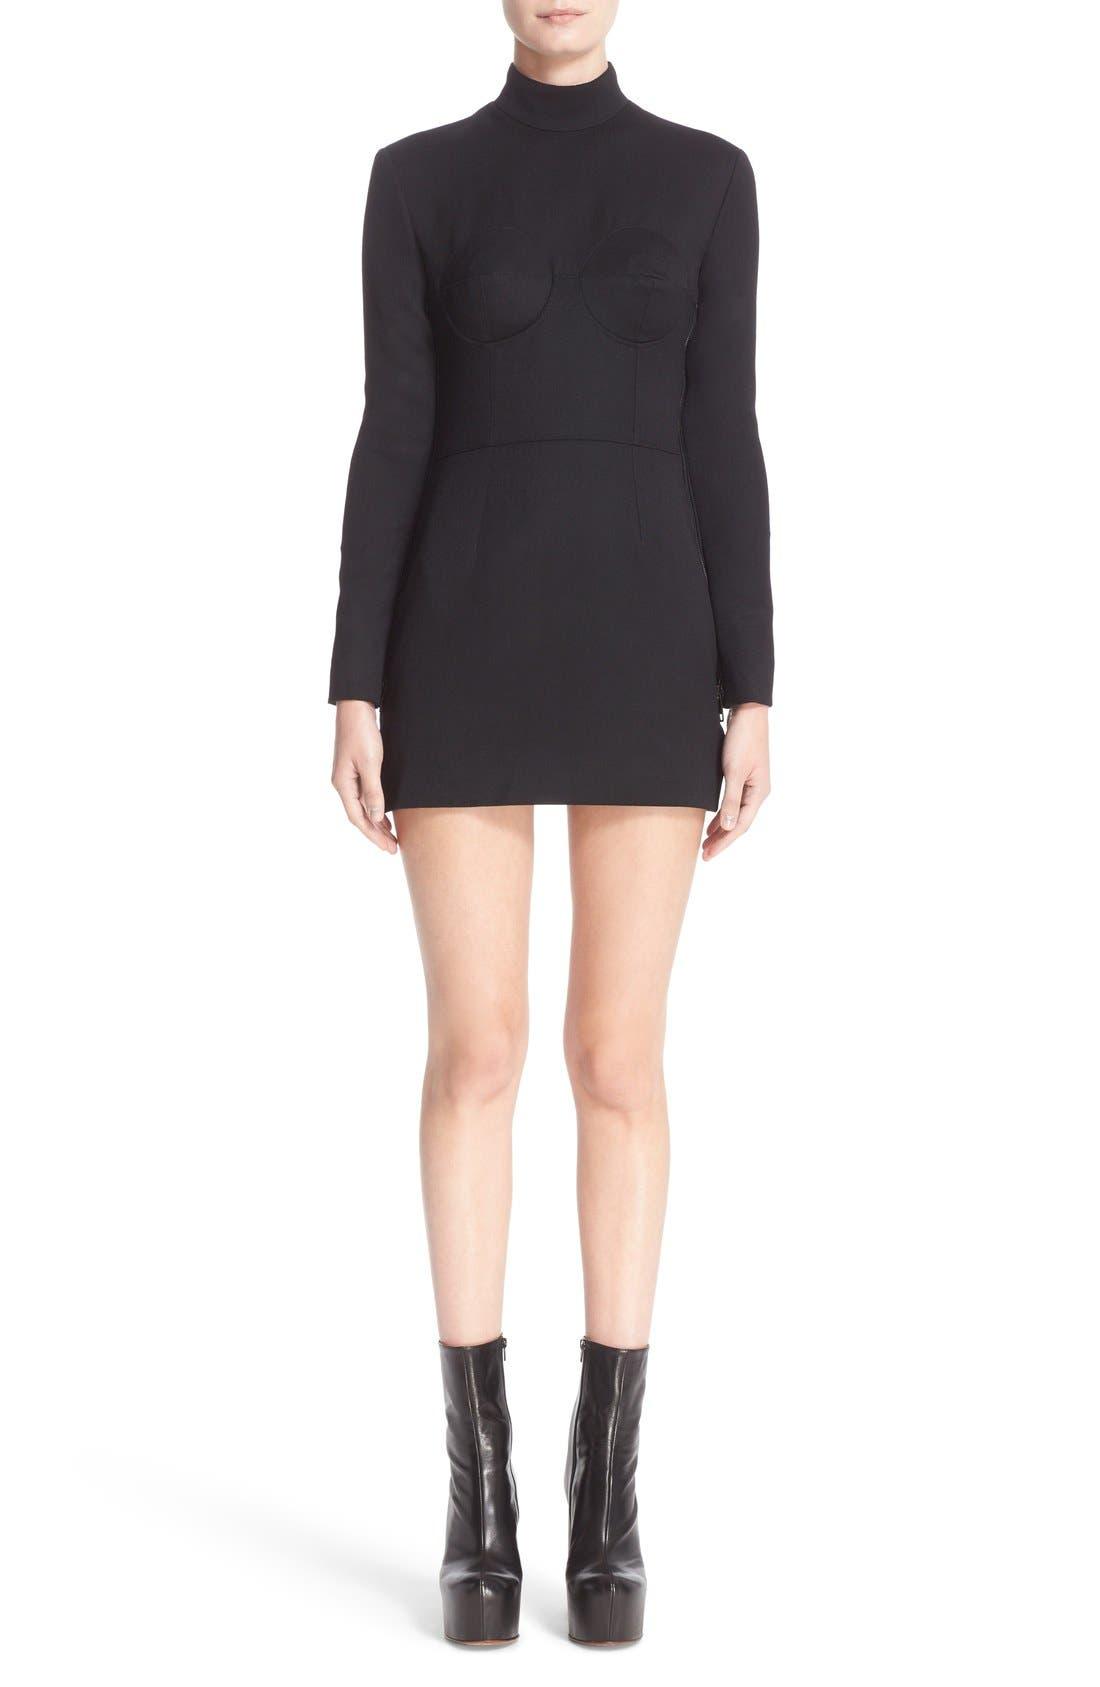 Alternate Image 1 Selected - Vetements 'Sado' Wool Minidress